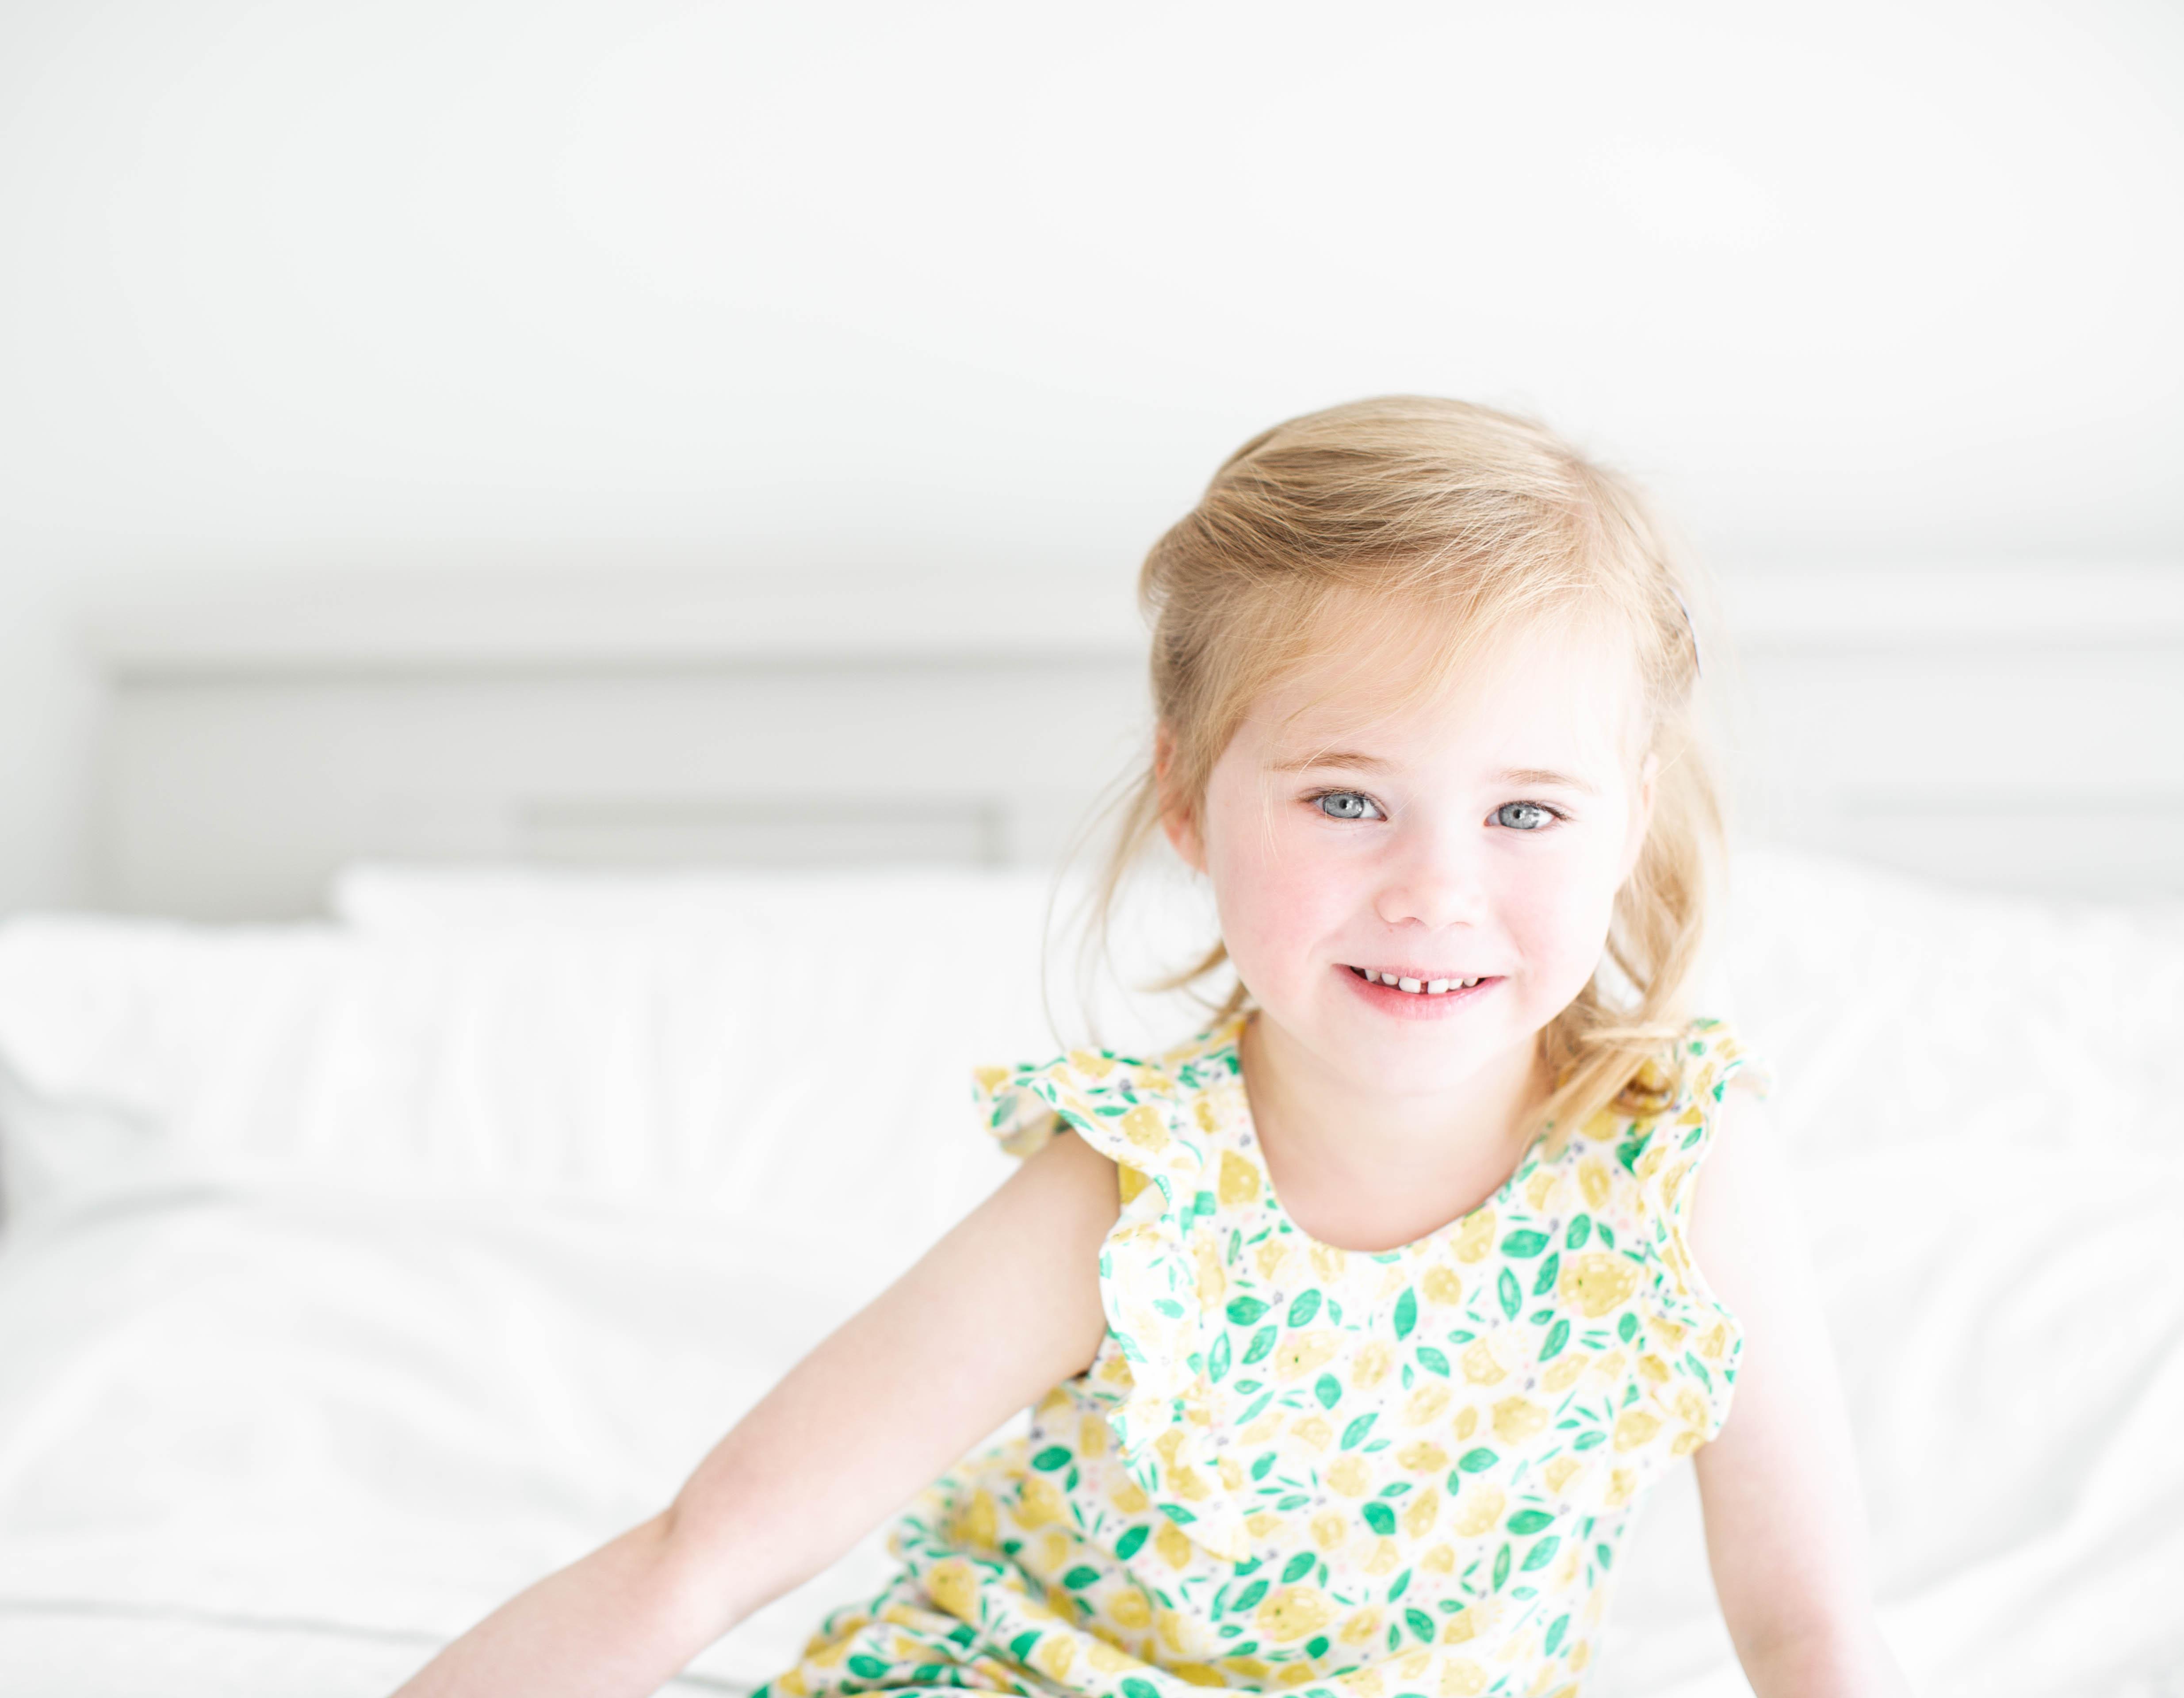 A girl smiling at the camera.